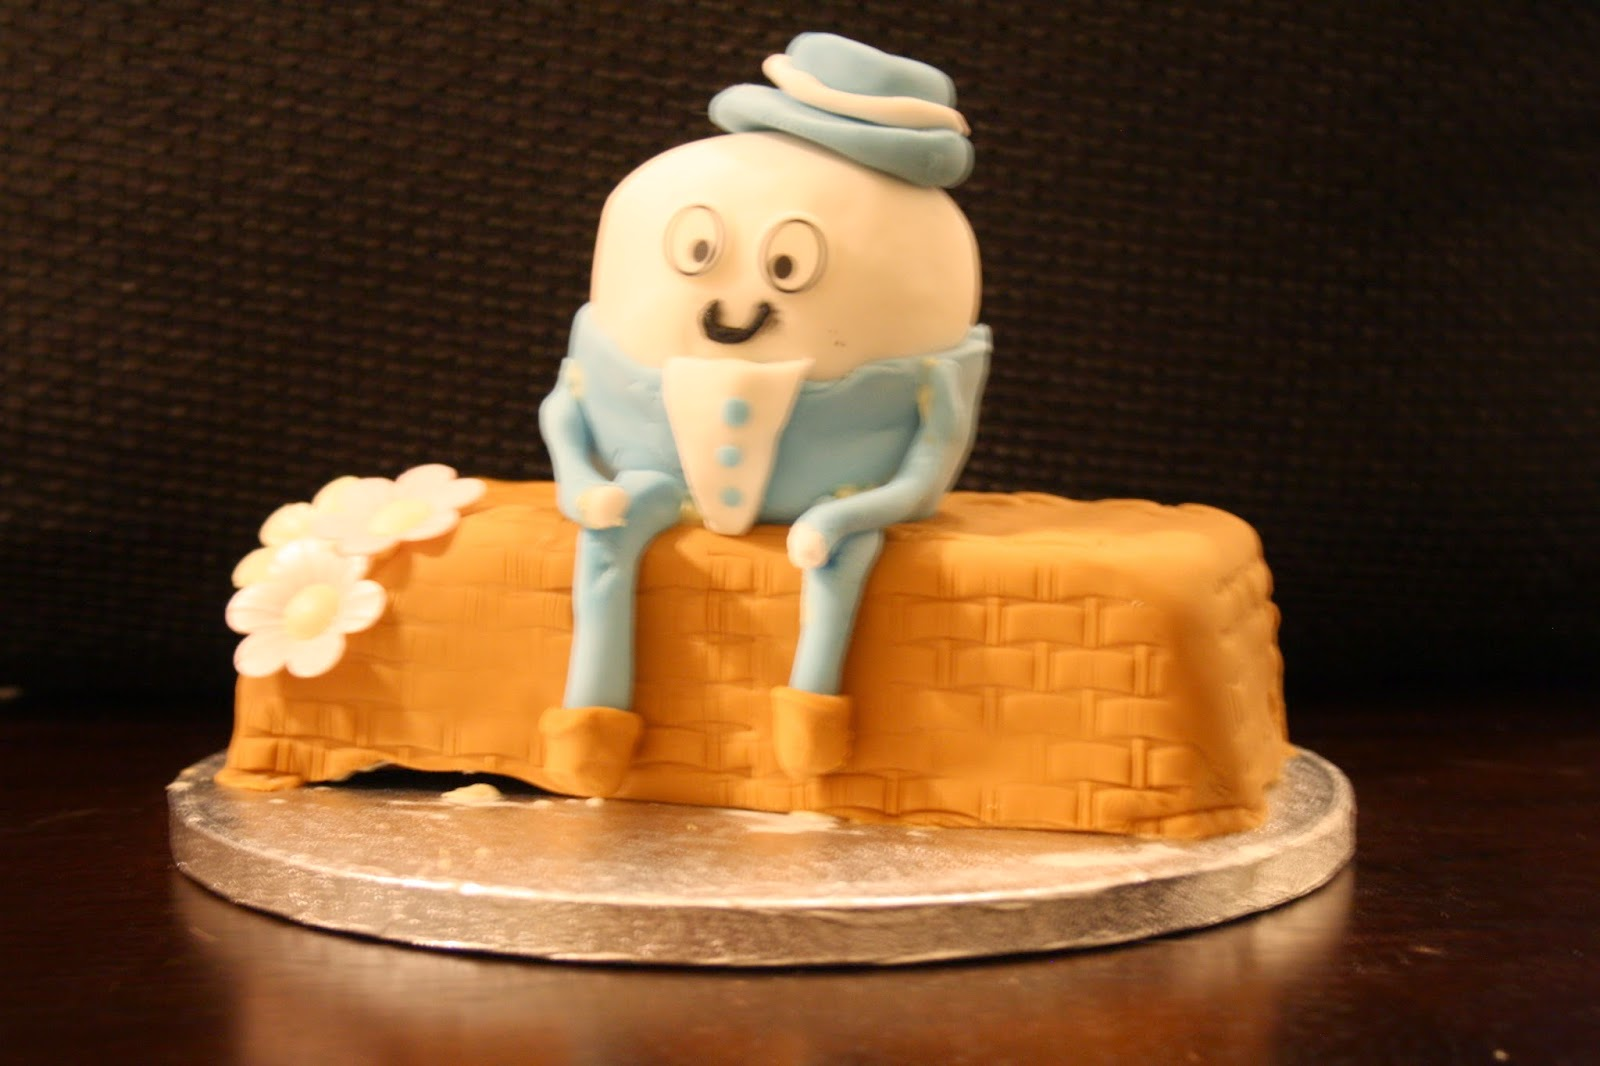 Humpty dumpty creme egg cake